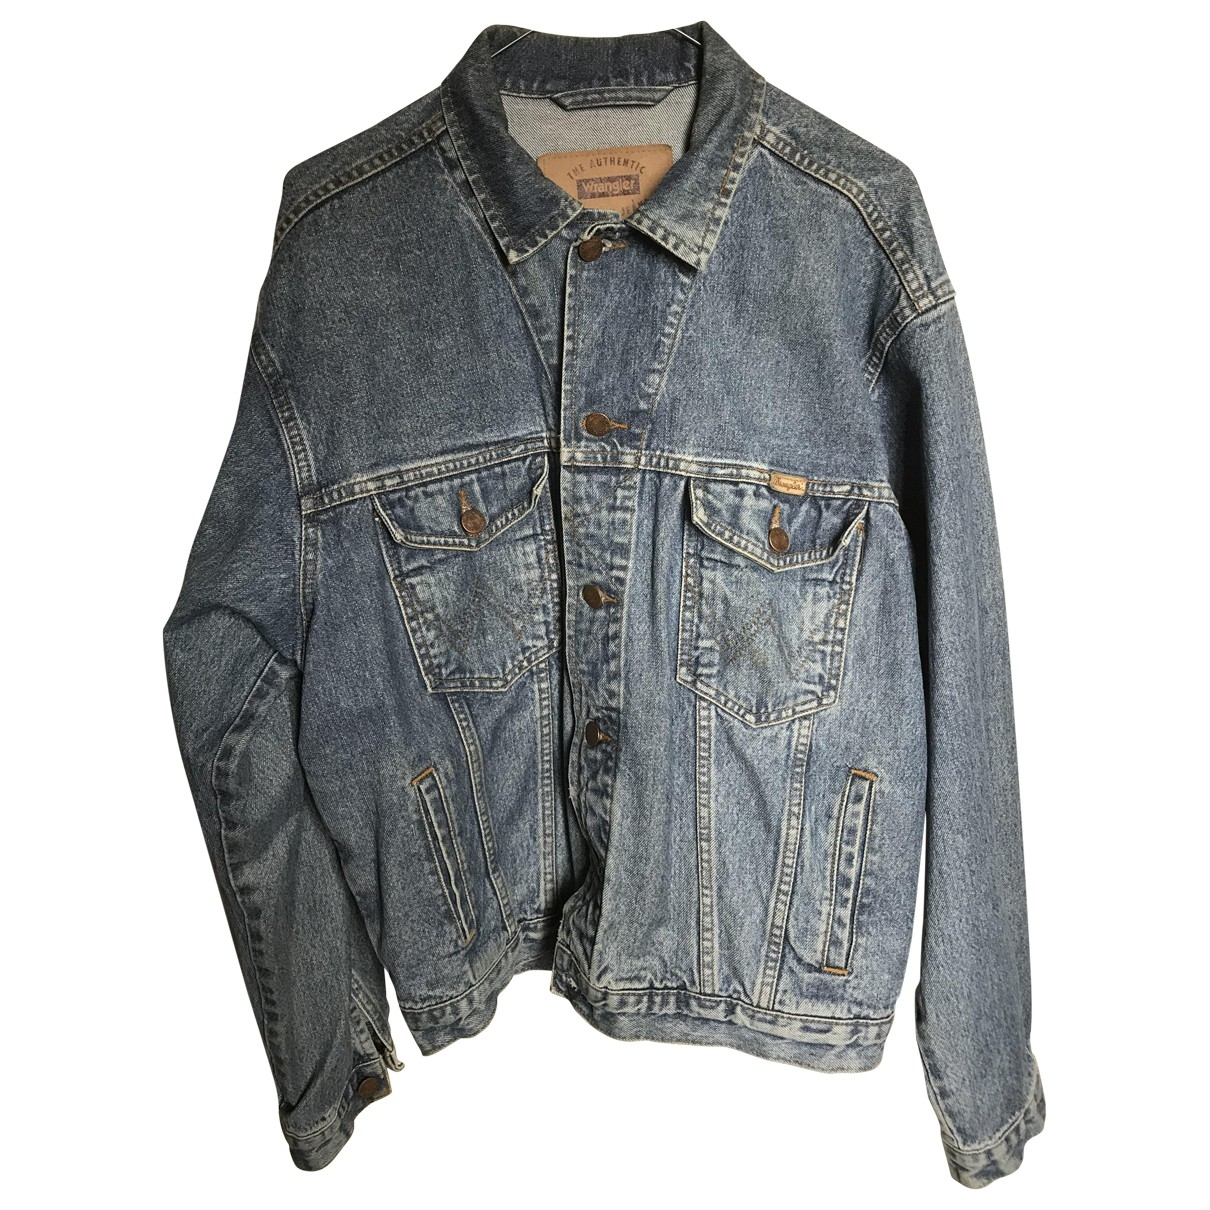 Wrangler \N Blue Denim - Jeans jacket  for Men L International